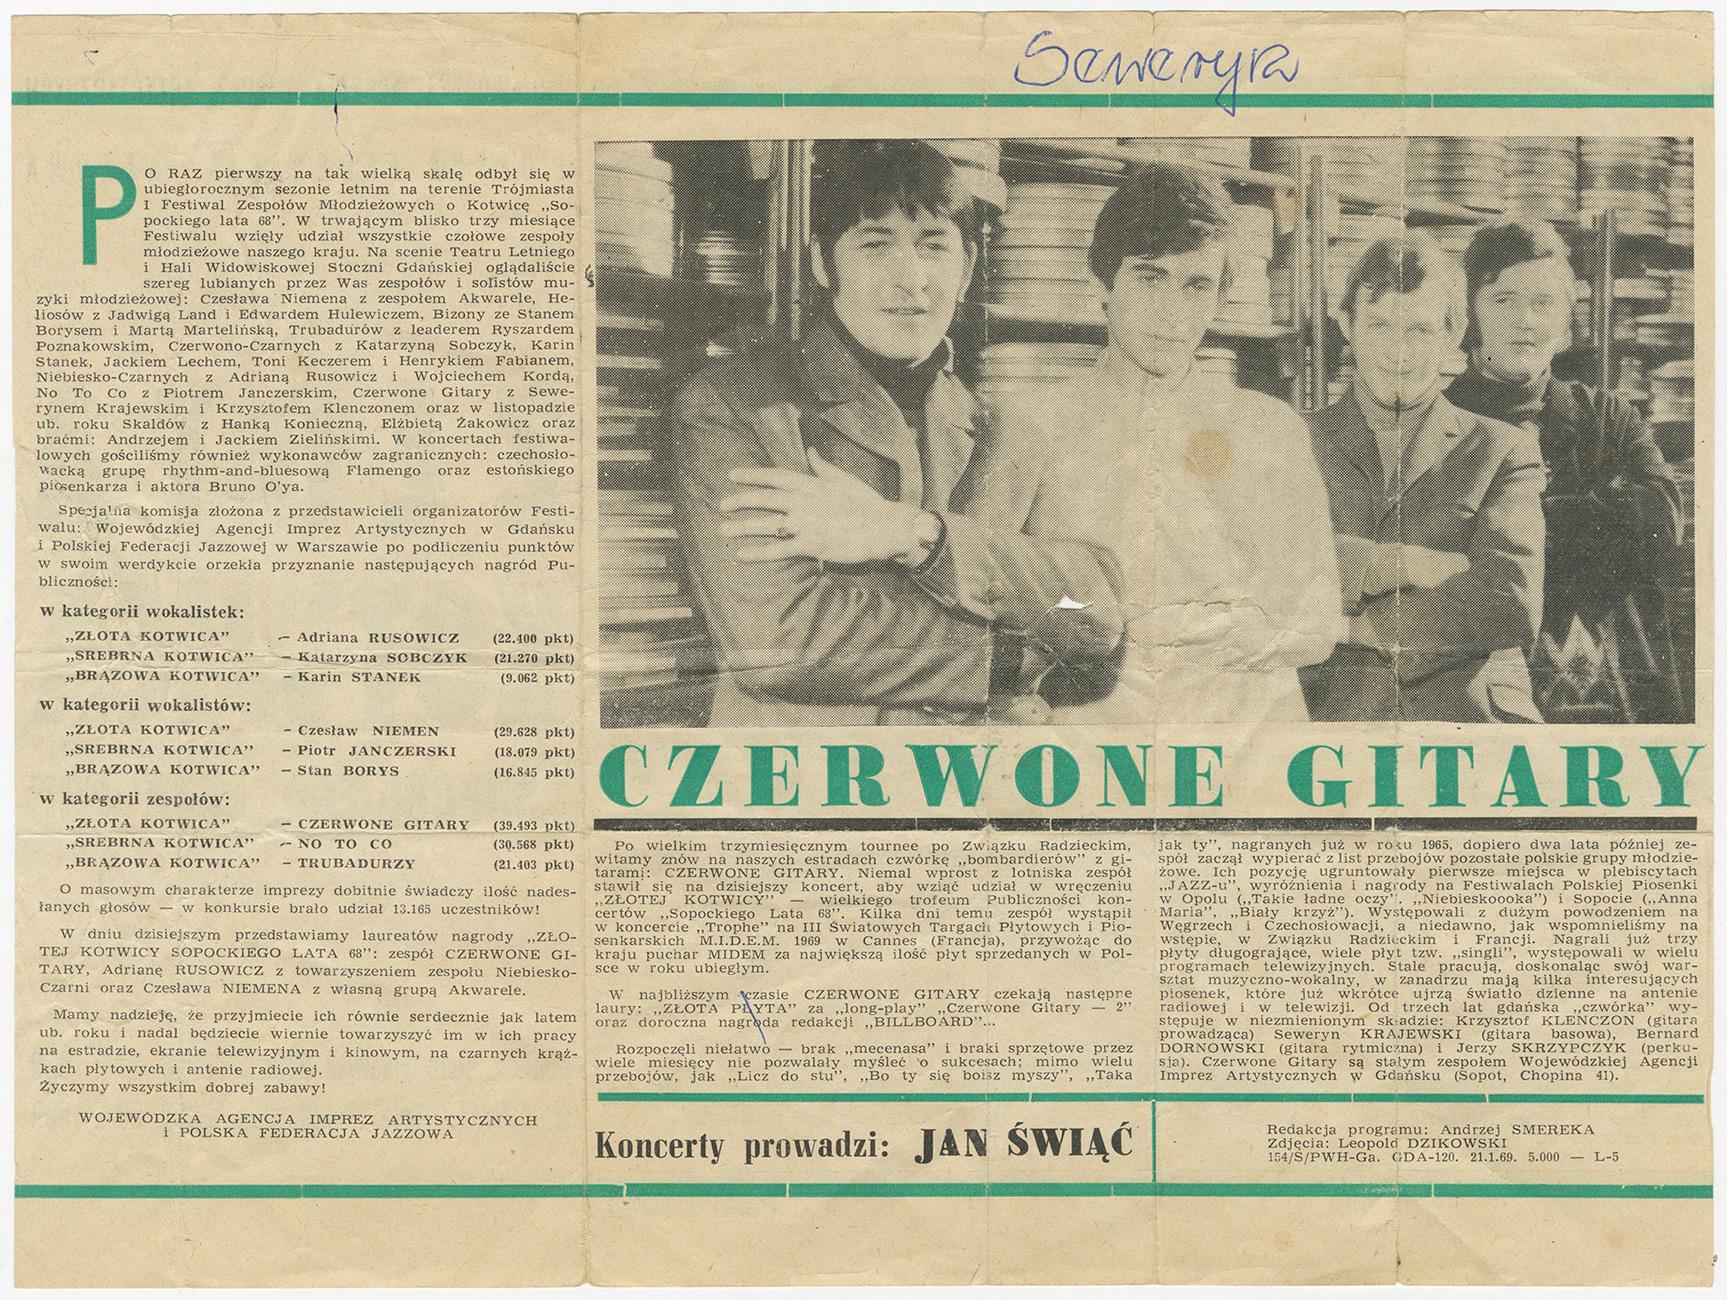 1969-1978_czg_artykul